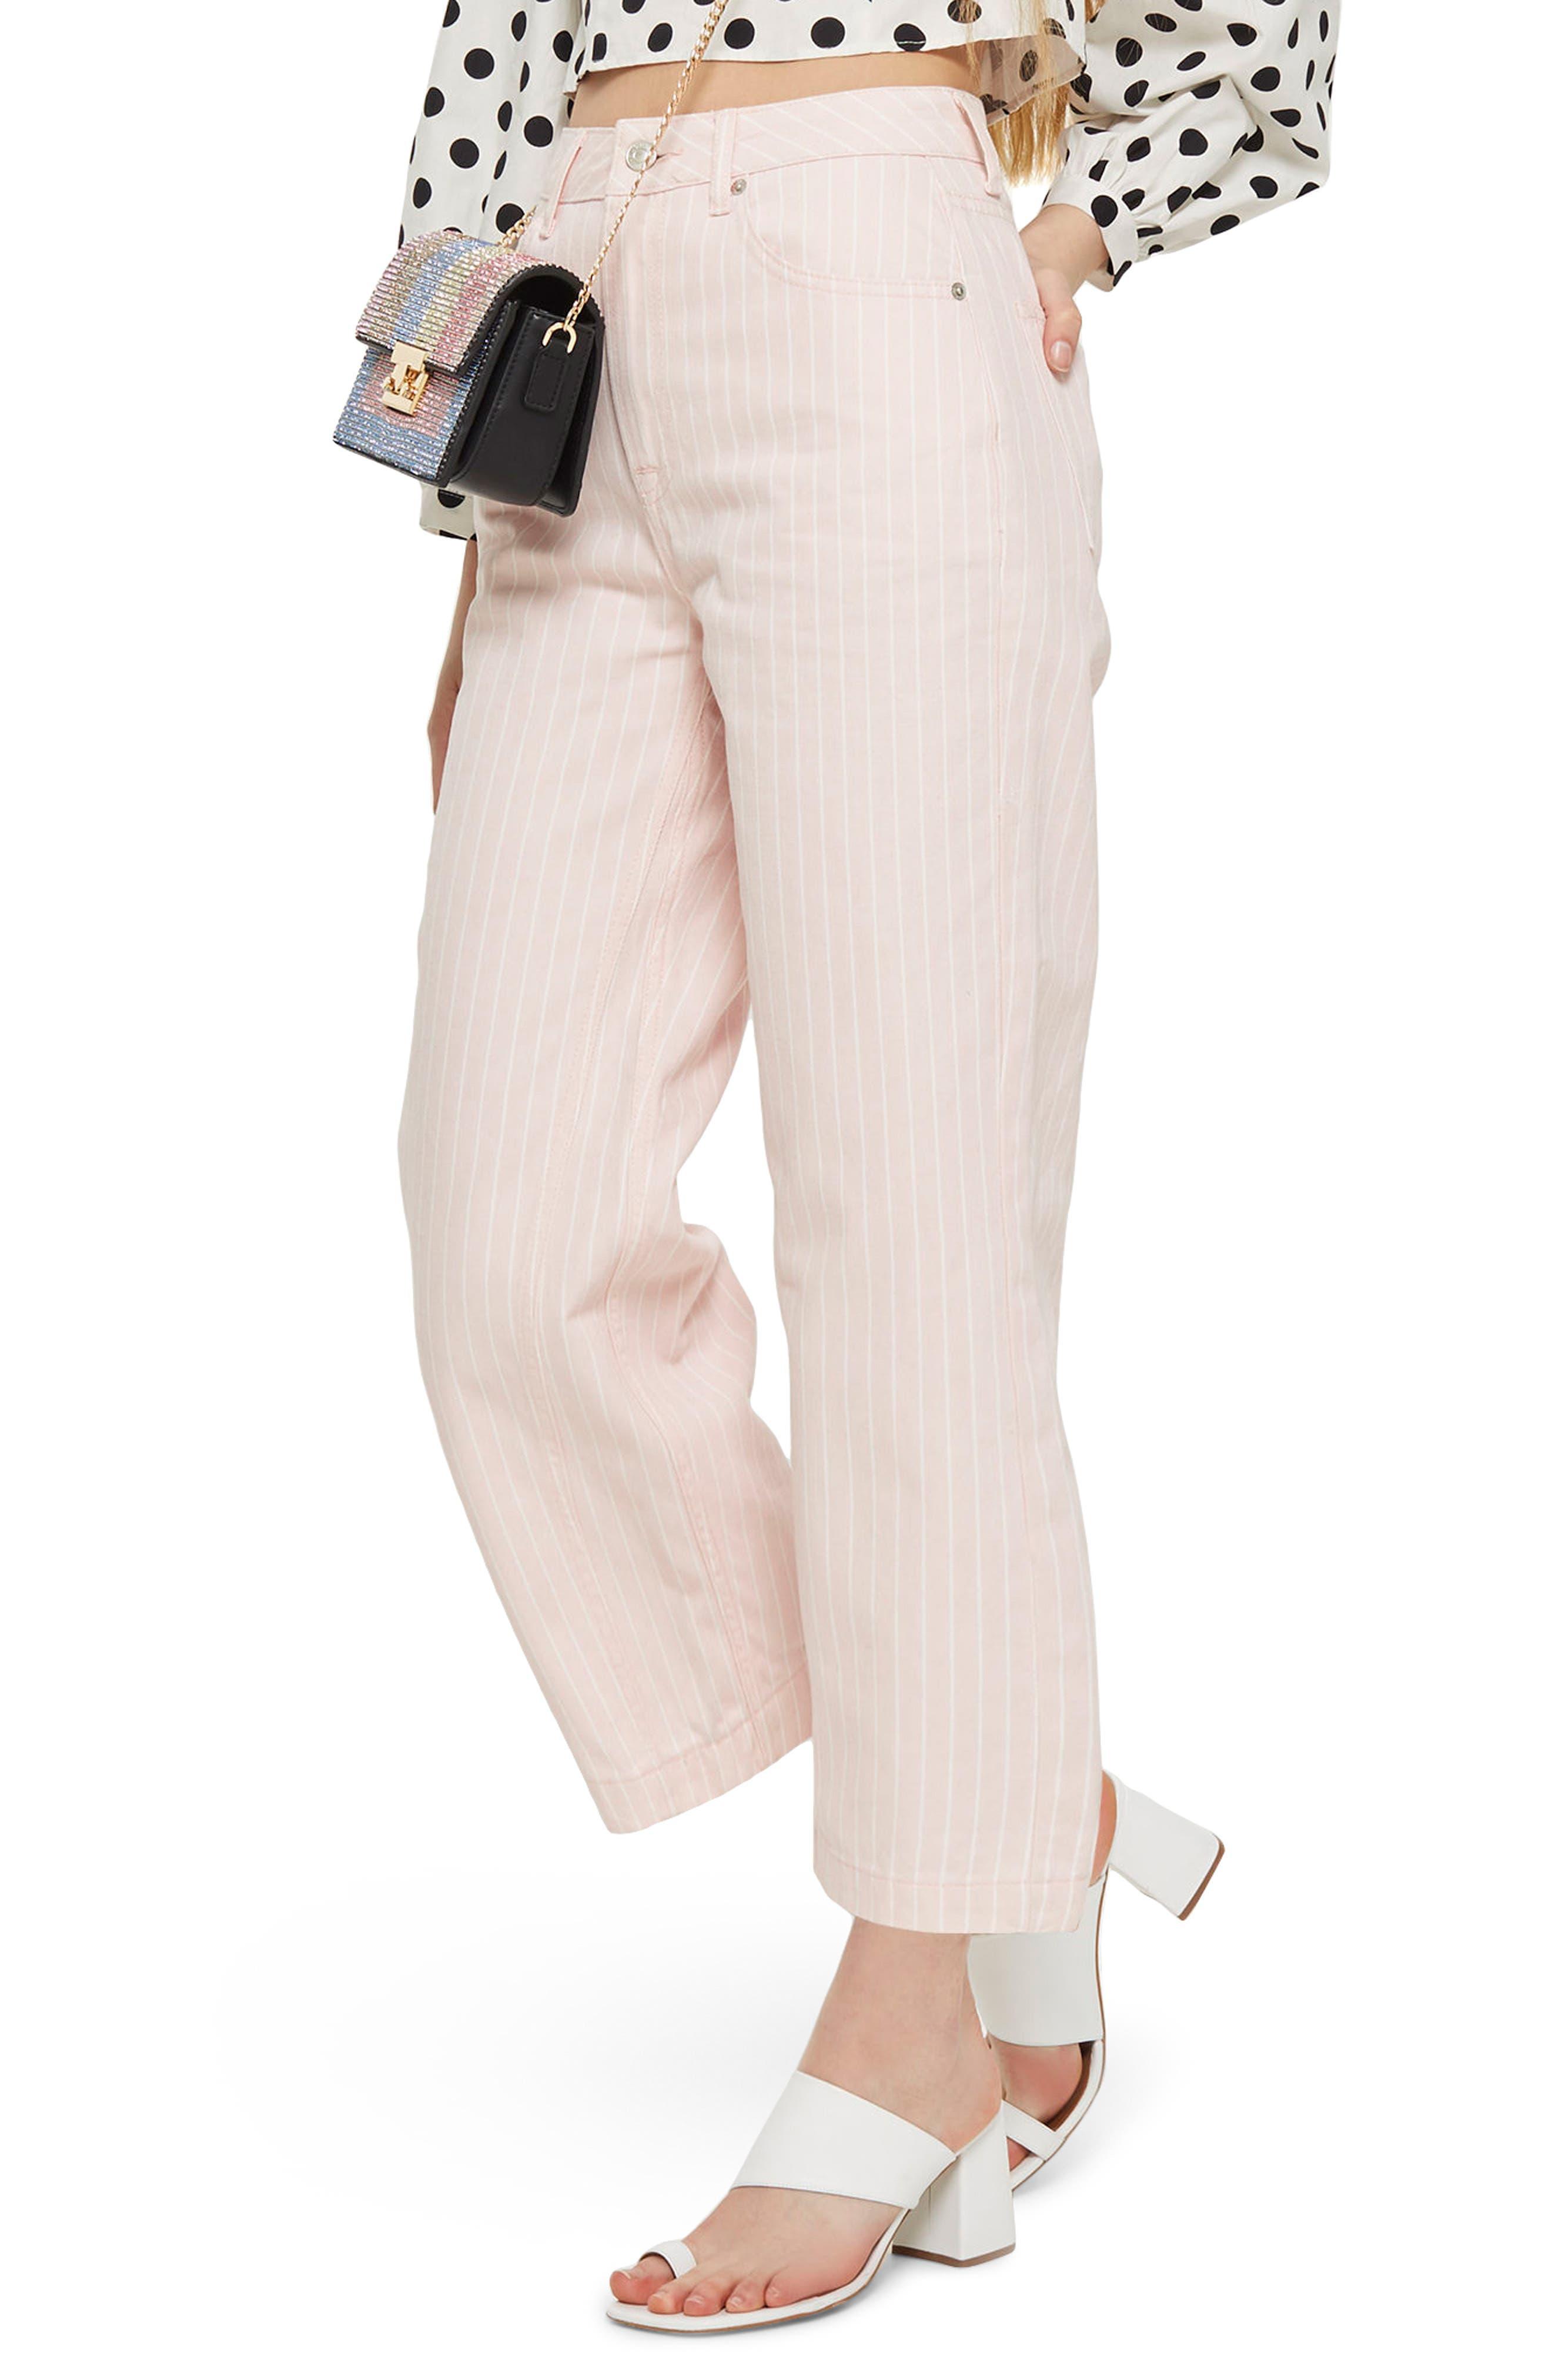 Topshop Pink Stripe Wide Leg Crop Jeans